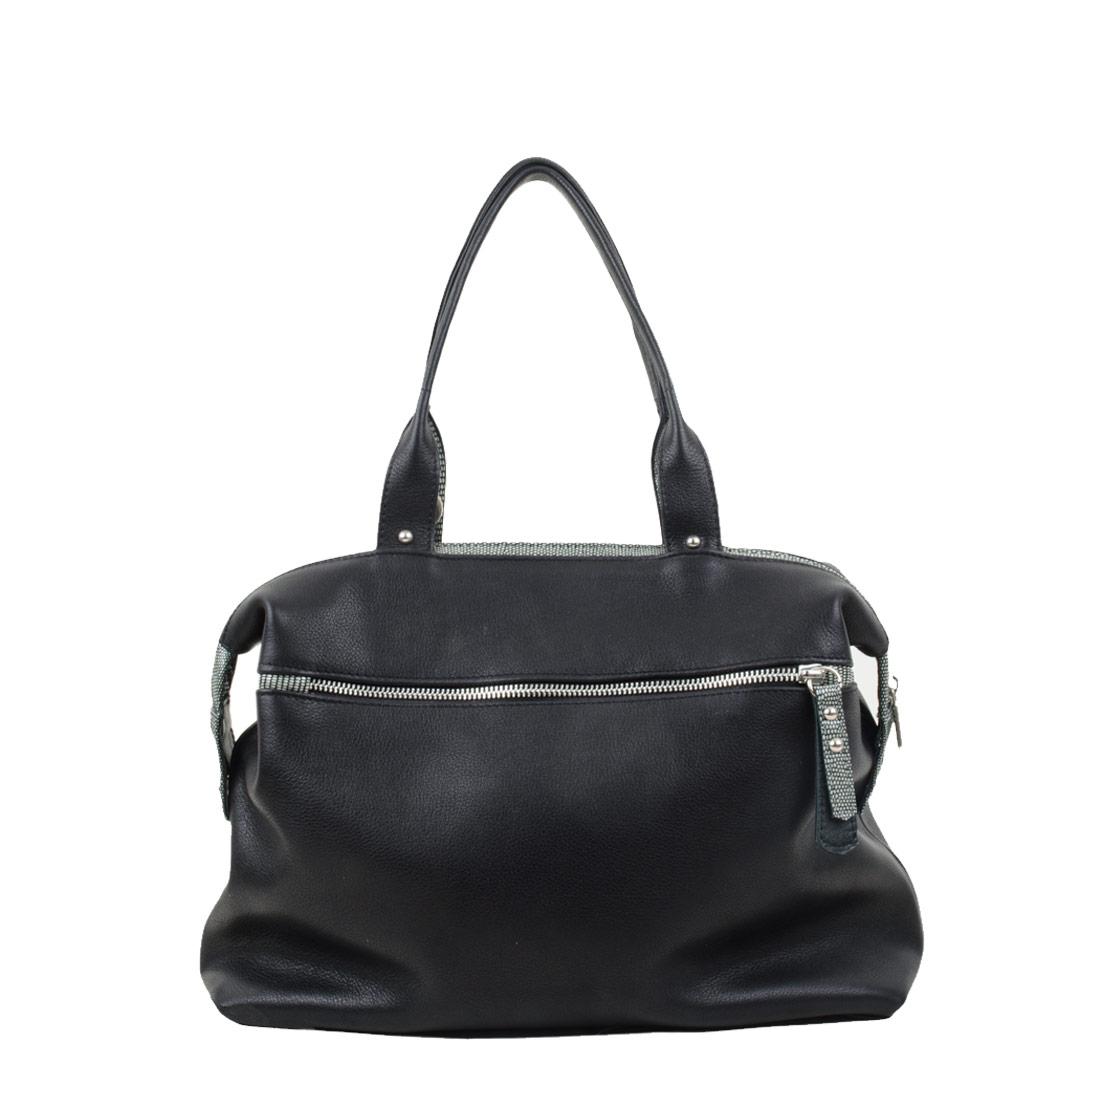 Grace Black Leather Tote Bag